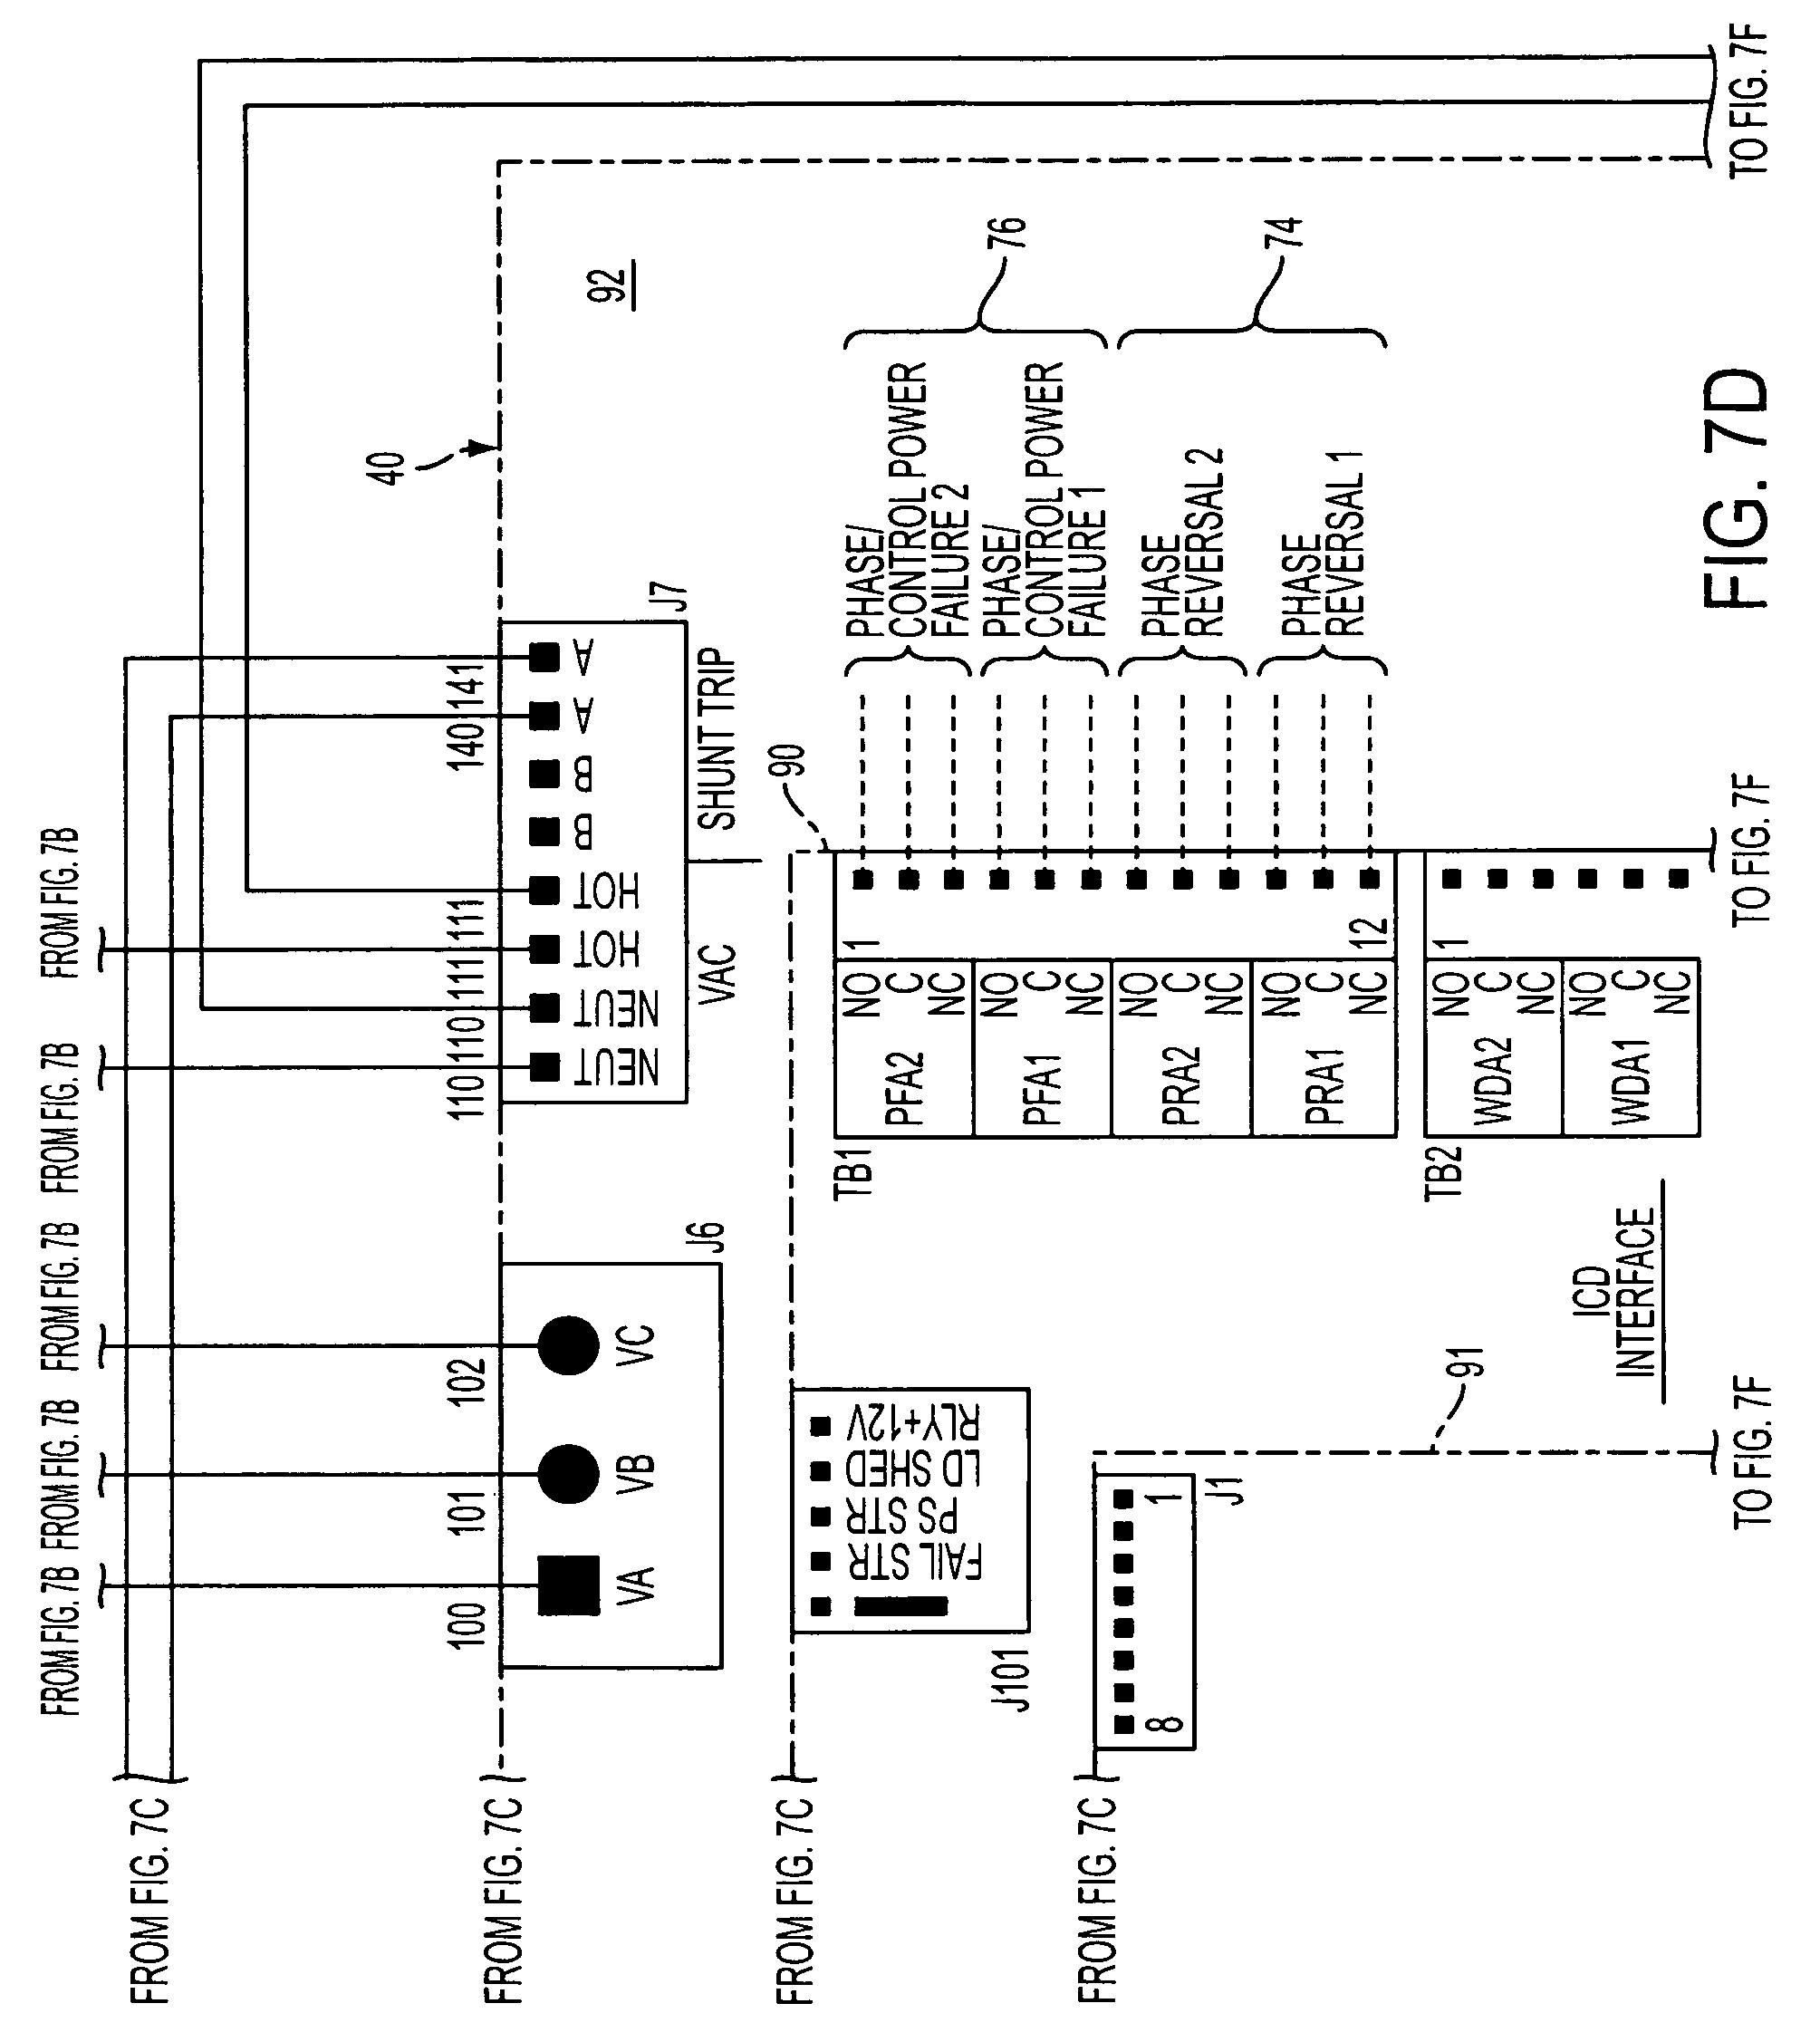 simplex pump wiring diagrams - 1974 ford f150 wiring diagram list data  schematic  santuariomadredelbuonconsiglio.it